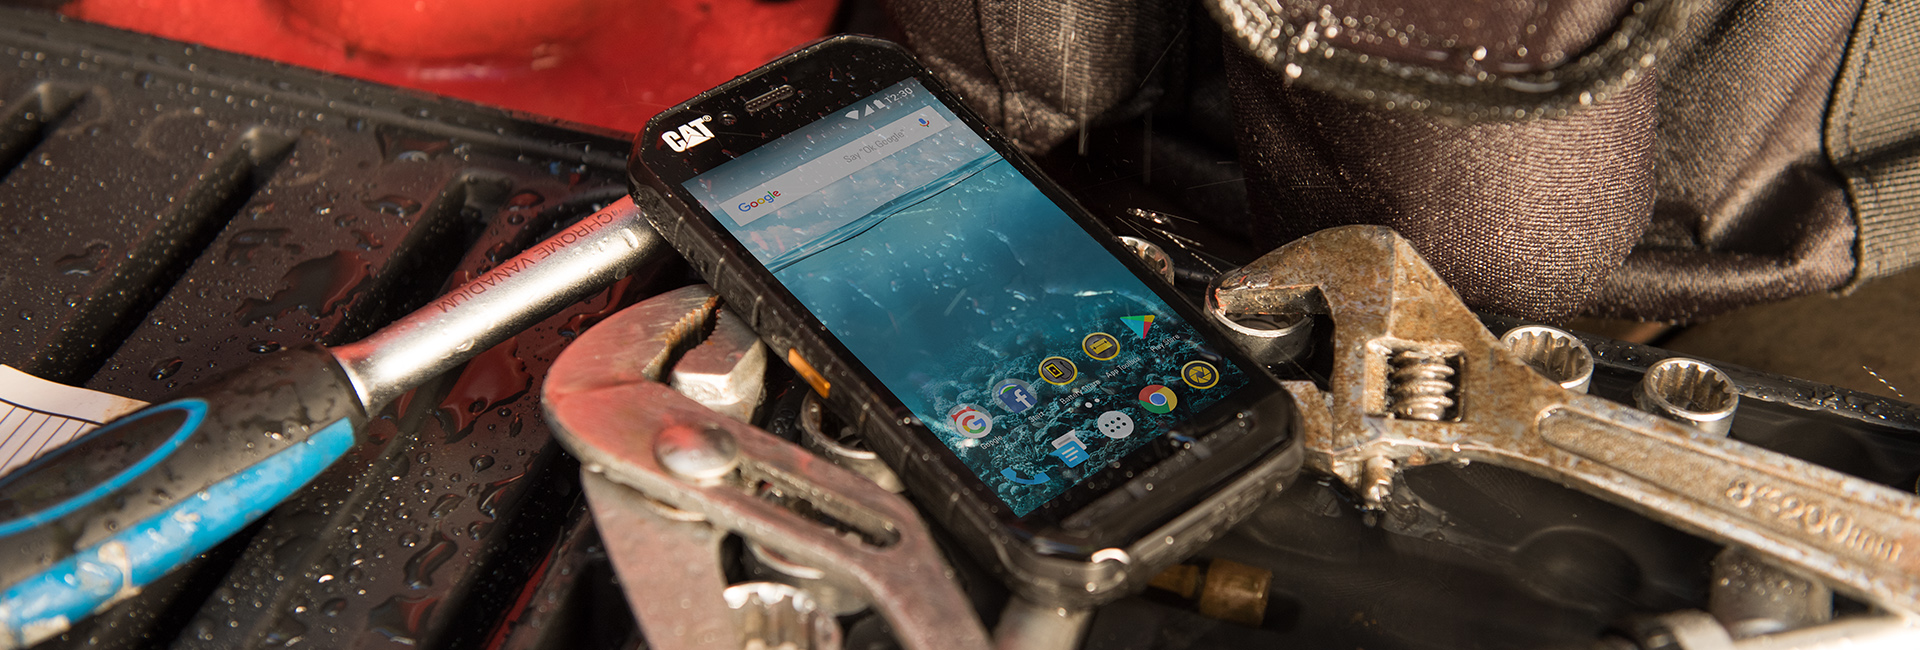 Free screen repairs on Cat devices | Cat phones